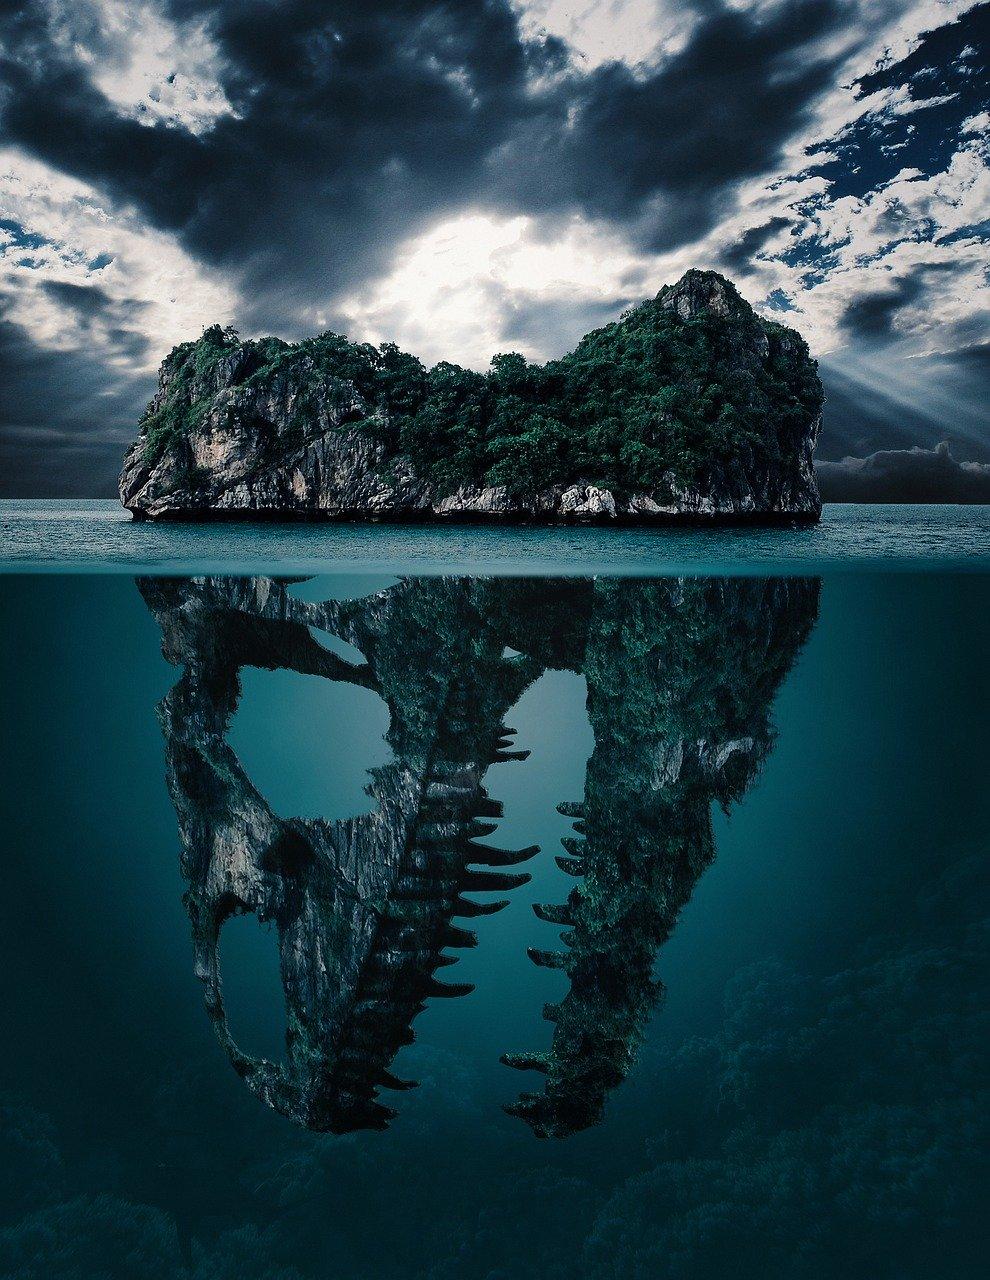 Beautiful nature wallpapers for iPhone underwater - dinosaur island wallpaper